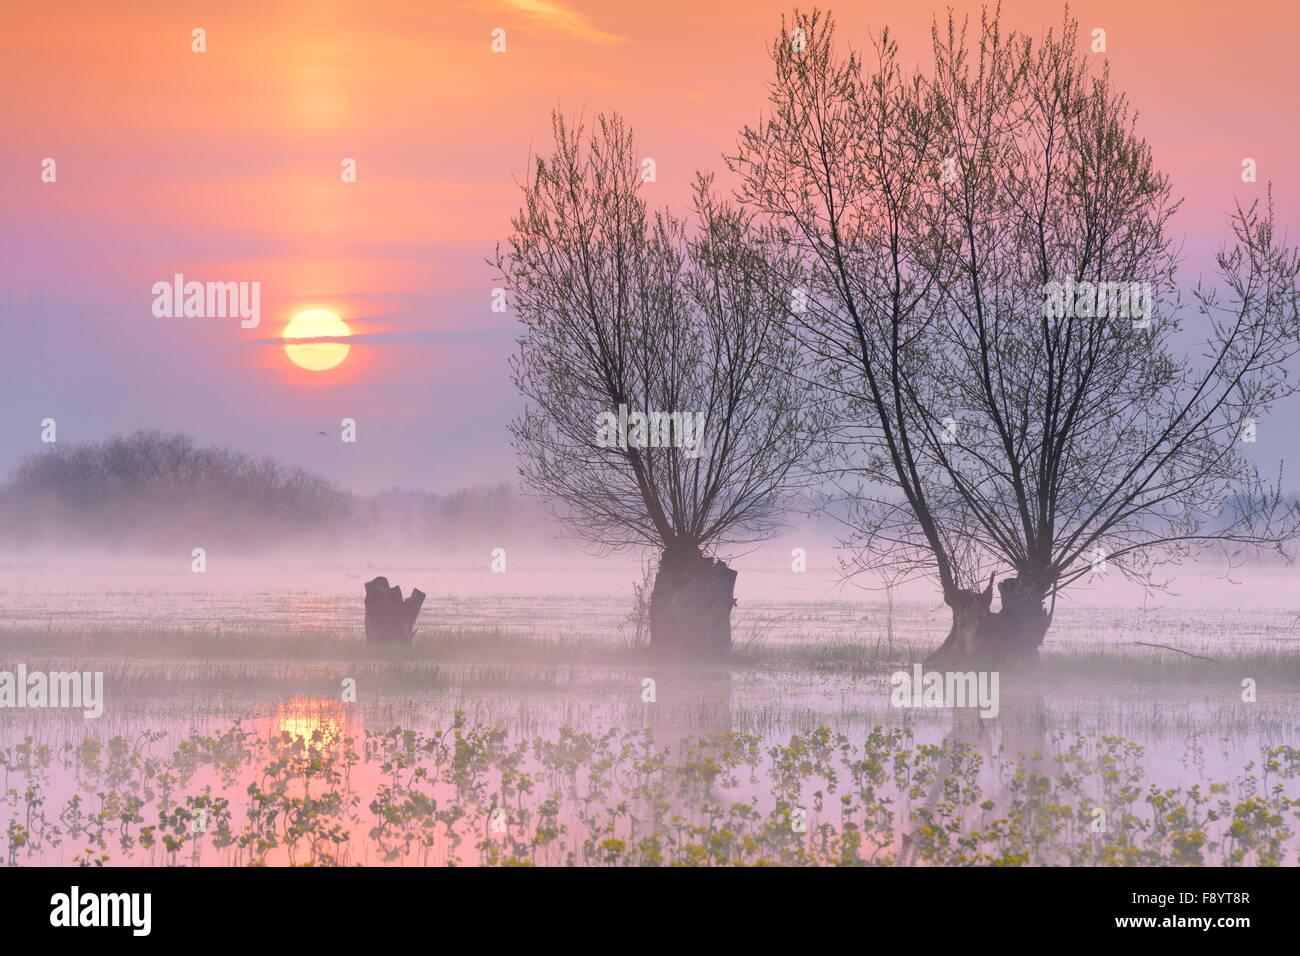 Sunrise landscape at Biebrza National Park, Podlasie region, Poland - Stock Image